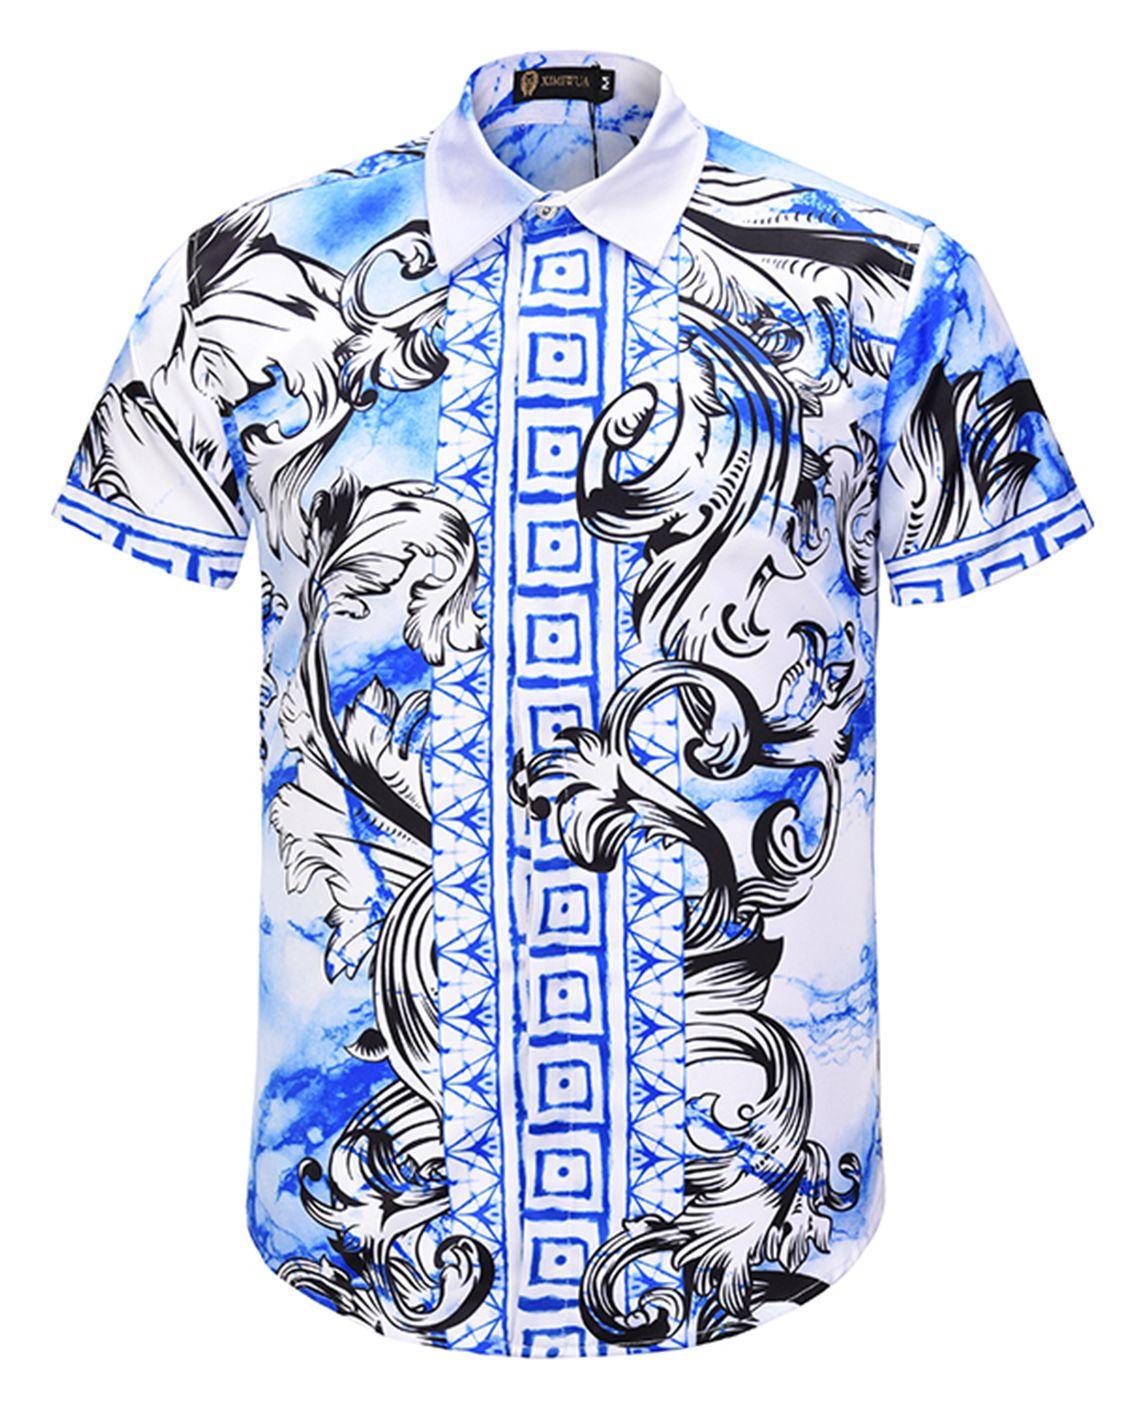 Pizoff Men S Short Sleeve Luxury Print Dress Shirt Al003 57 Printed Dress Shirts Men Short Sleeve Men Shirt Style [ 1410 x 1145 Pixel ]